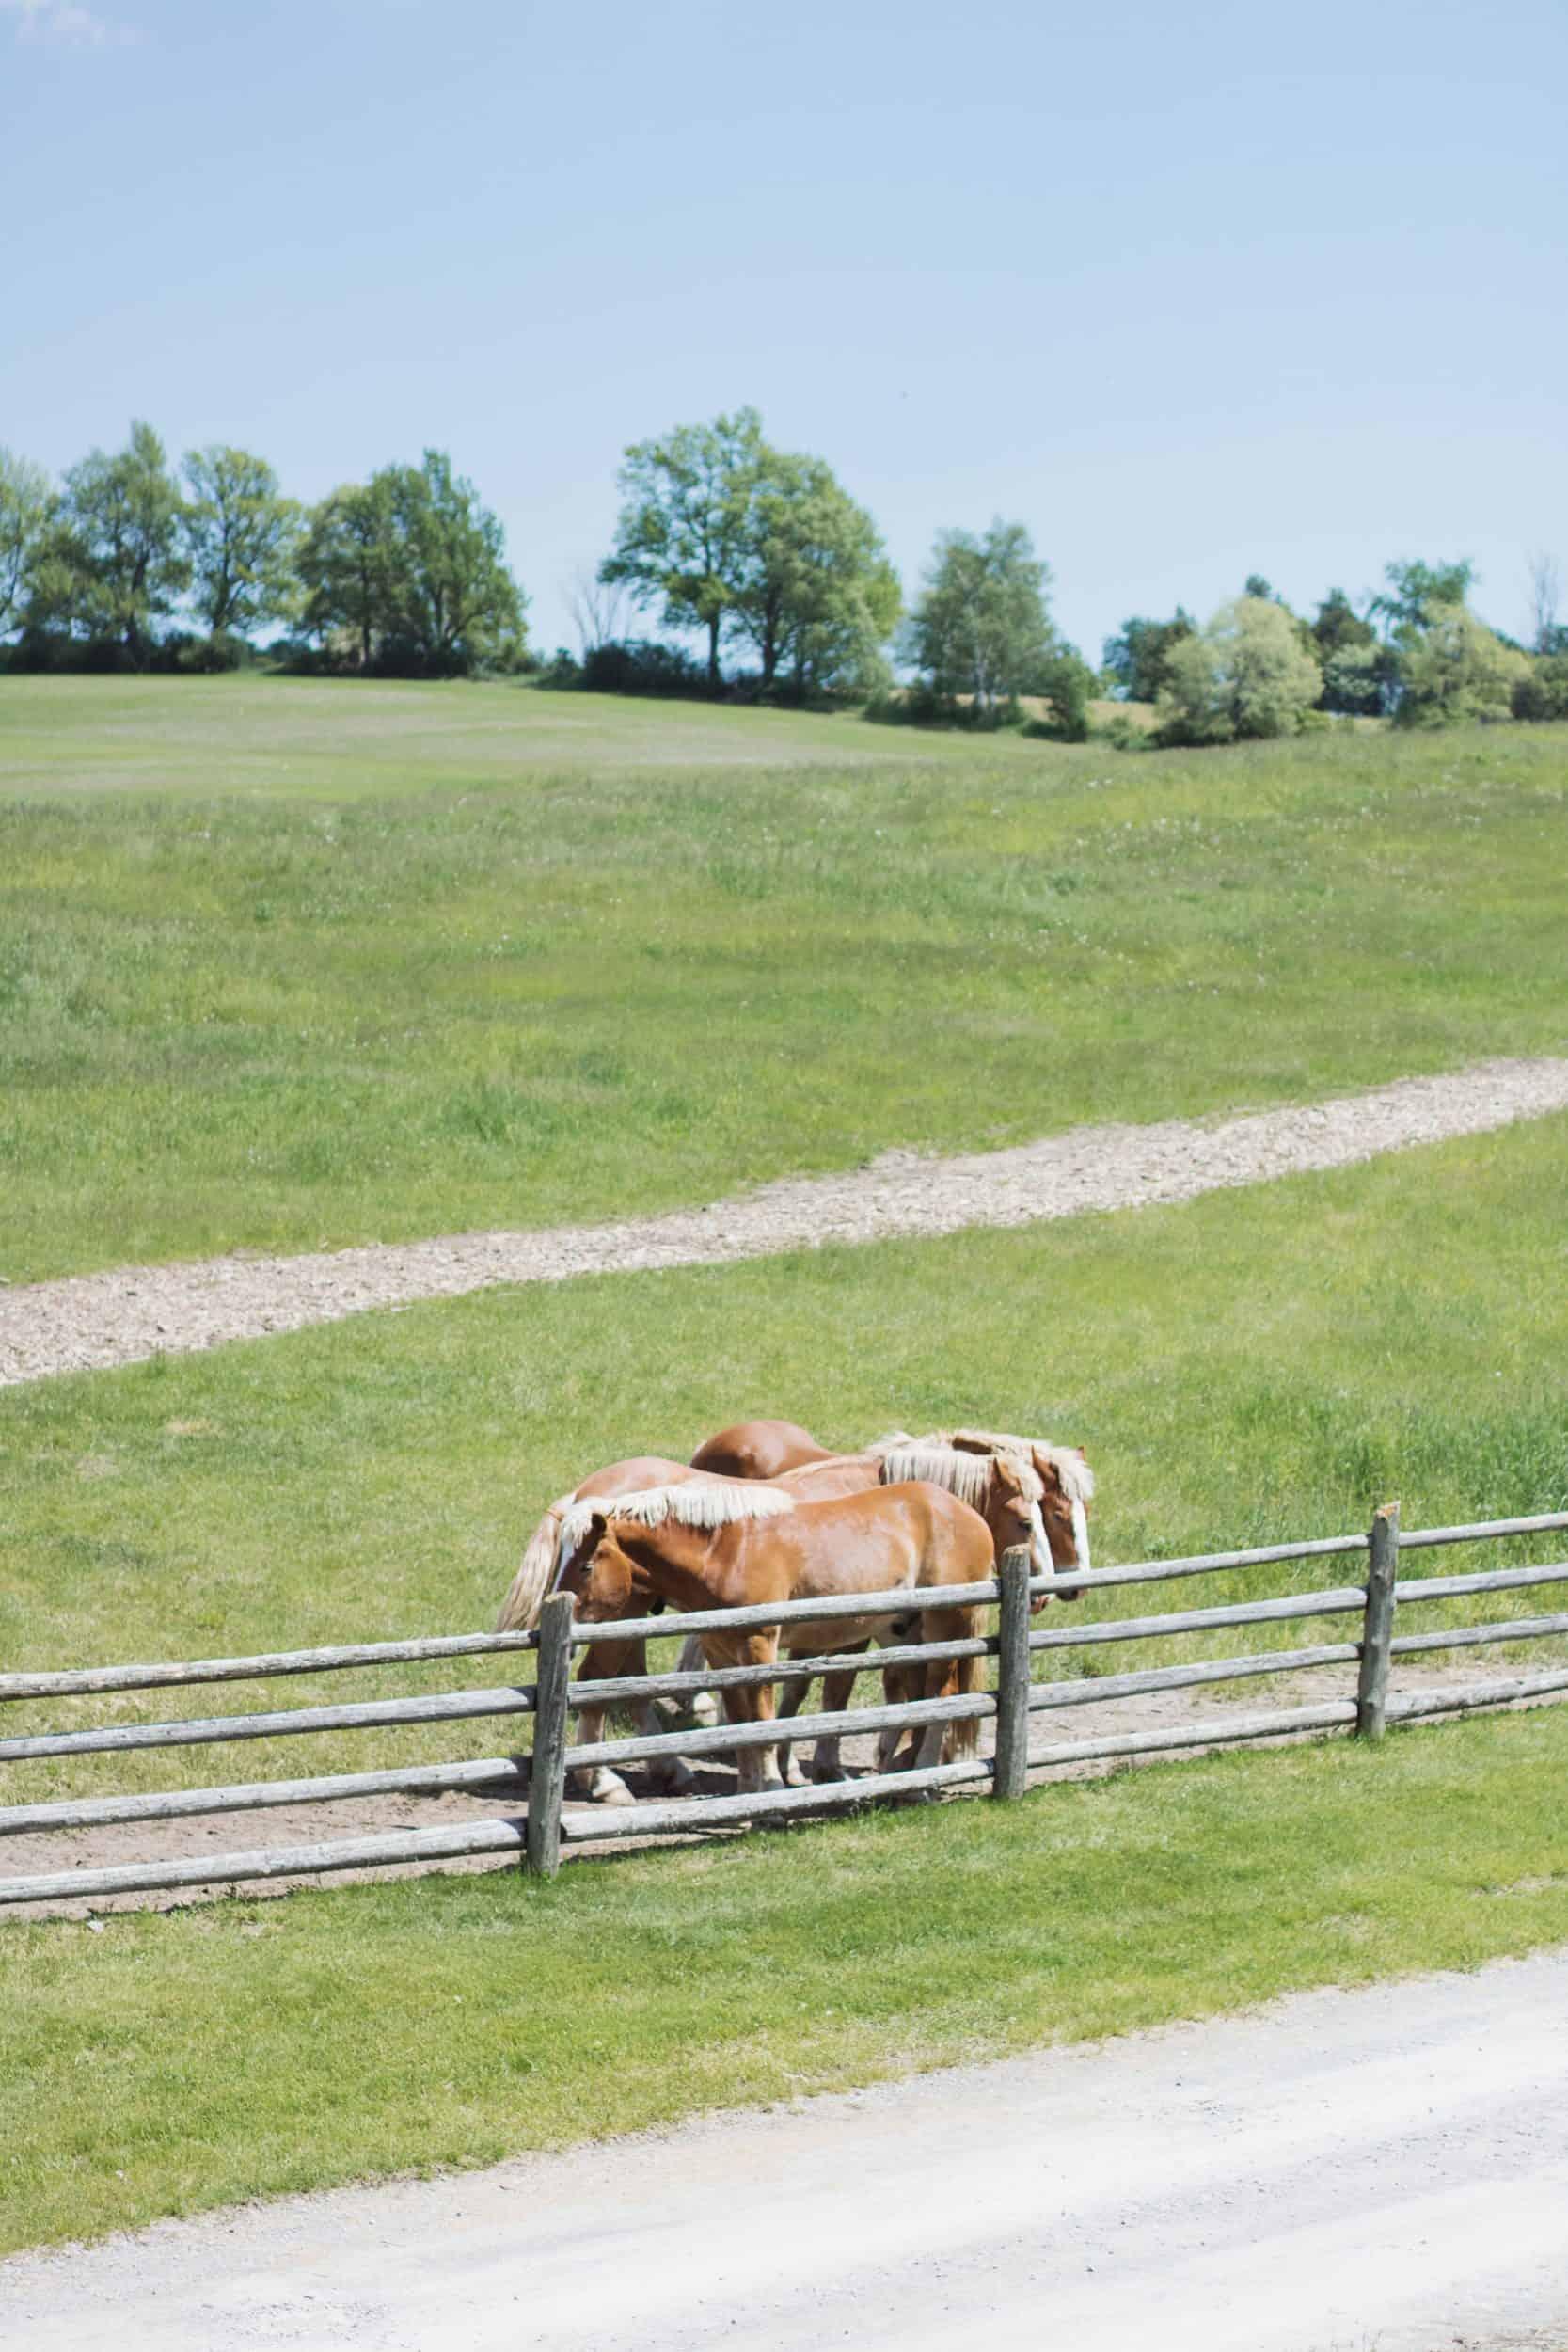 South Pond Farms in Pontypool, Ontario | wedding venues near Kawartha Lakes | rustic farmhouse venue near Toronto | Diary of a Toronto Girl, a Canadian lifestyle blog